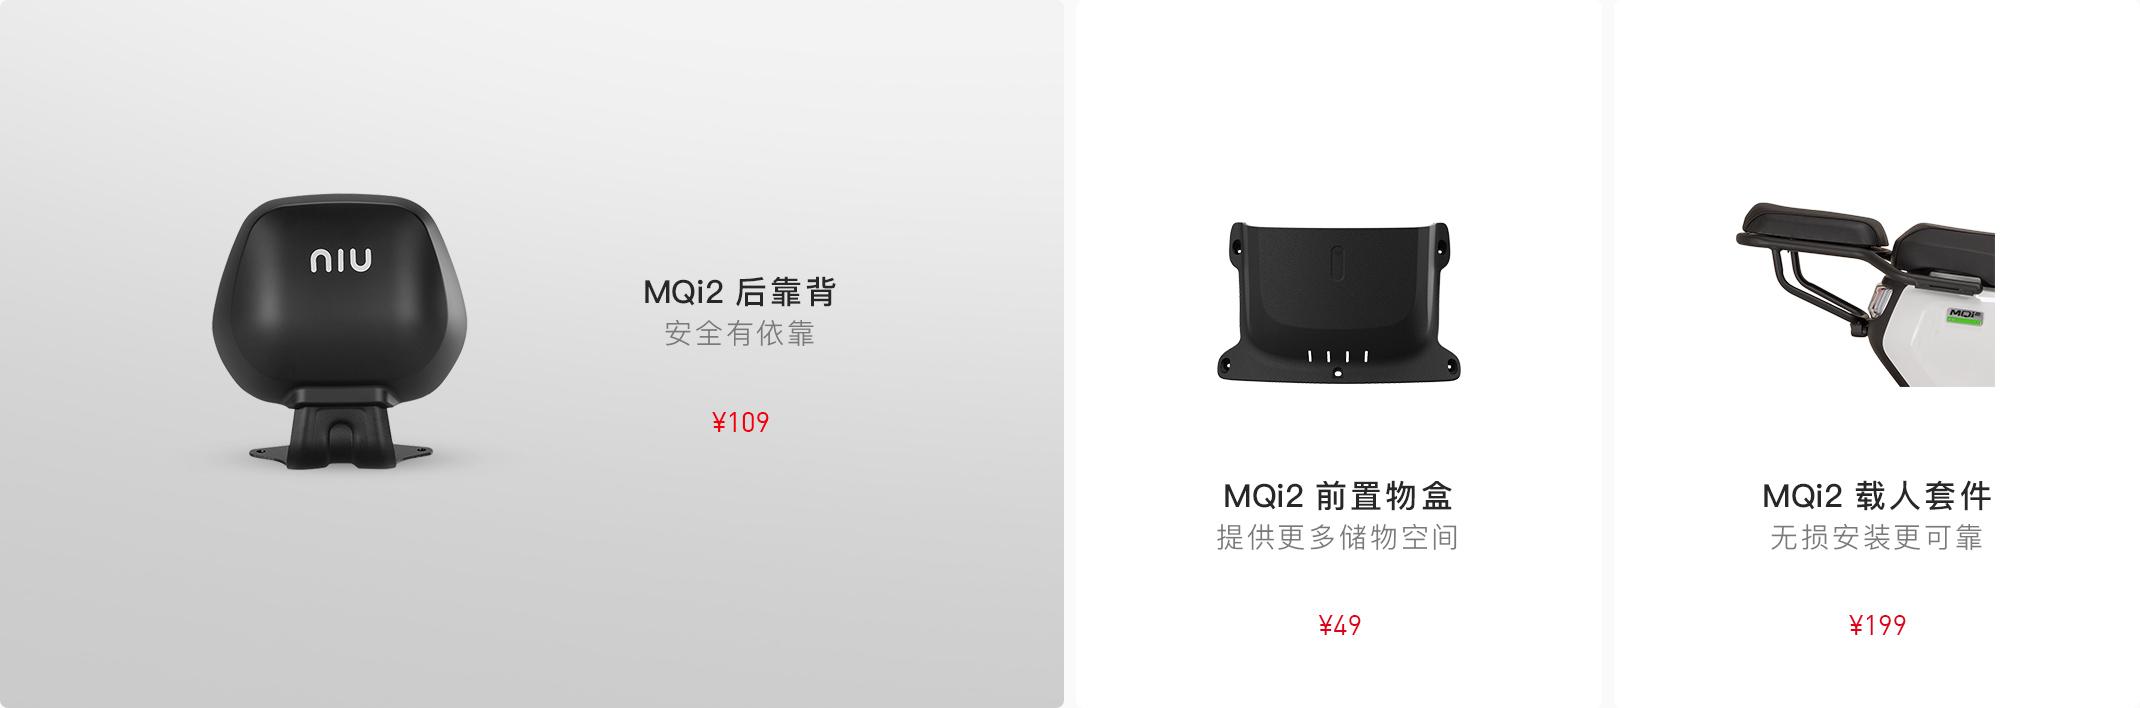 MQi2系列配件